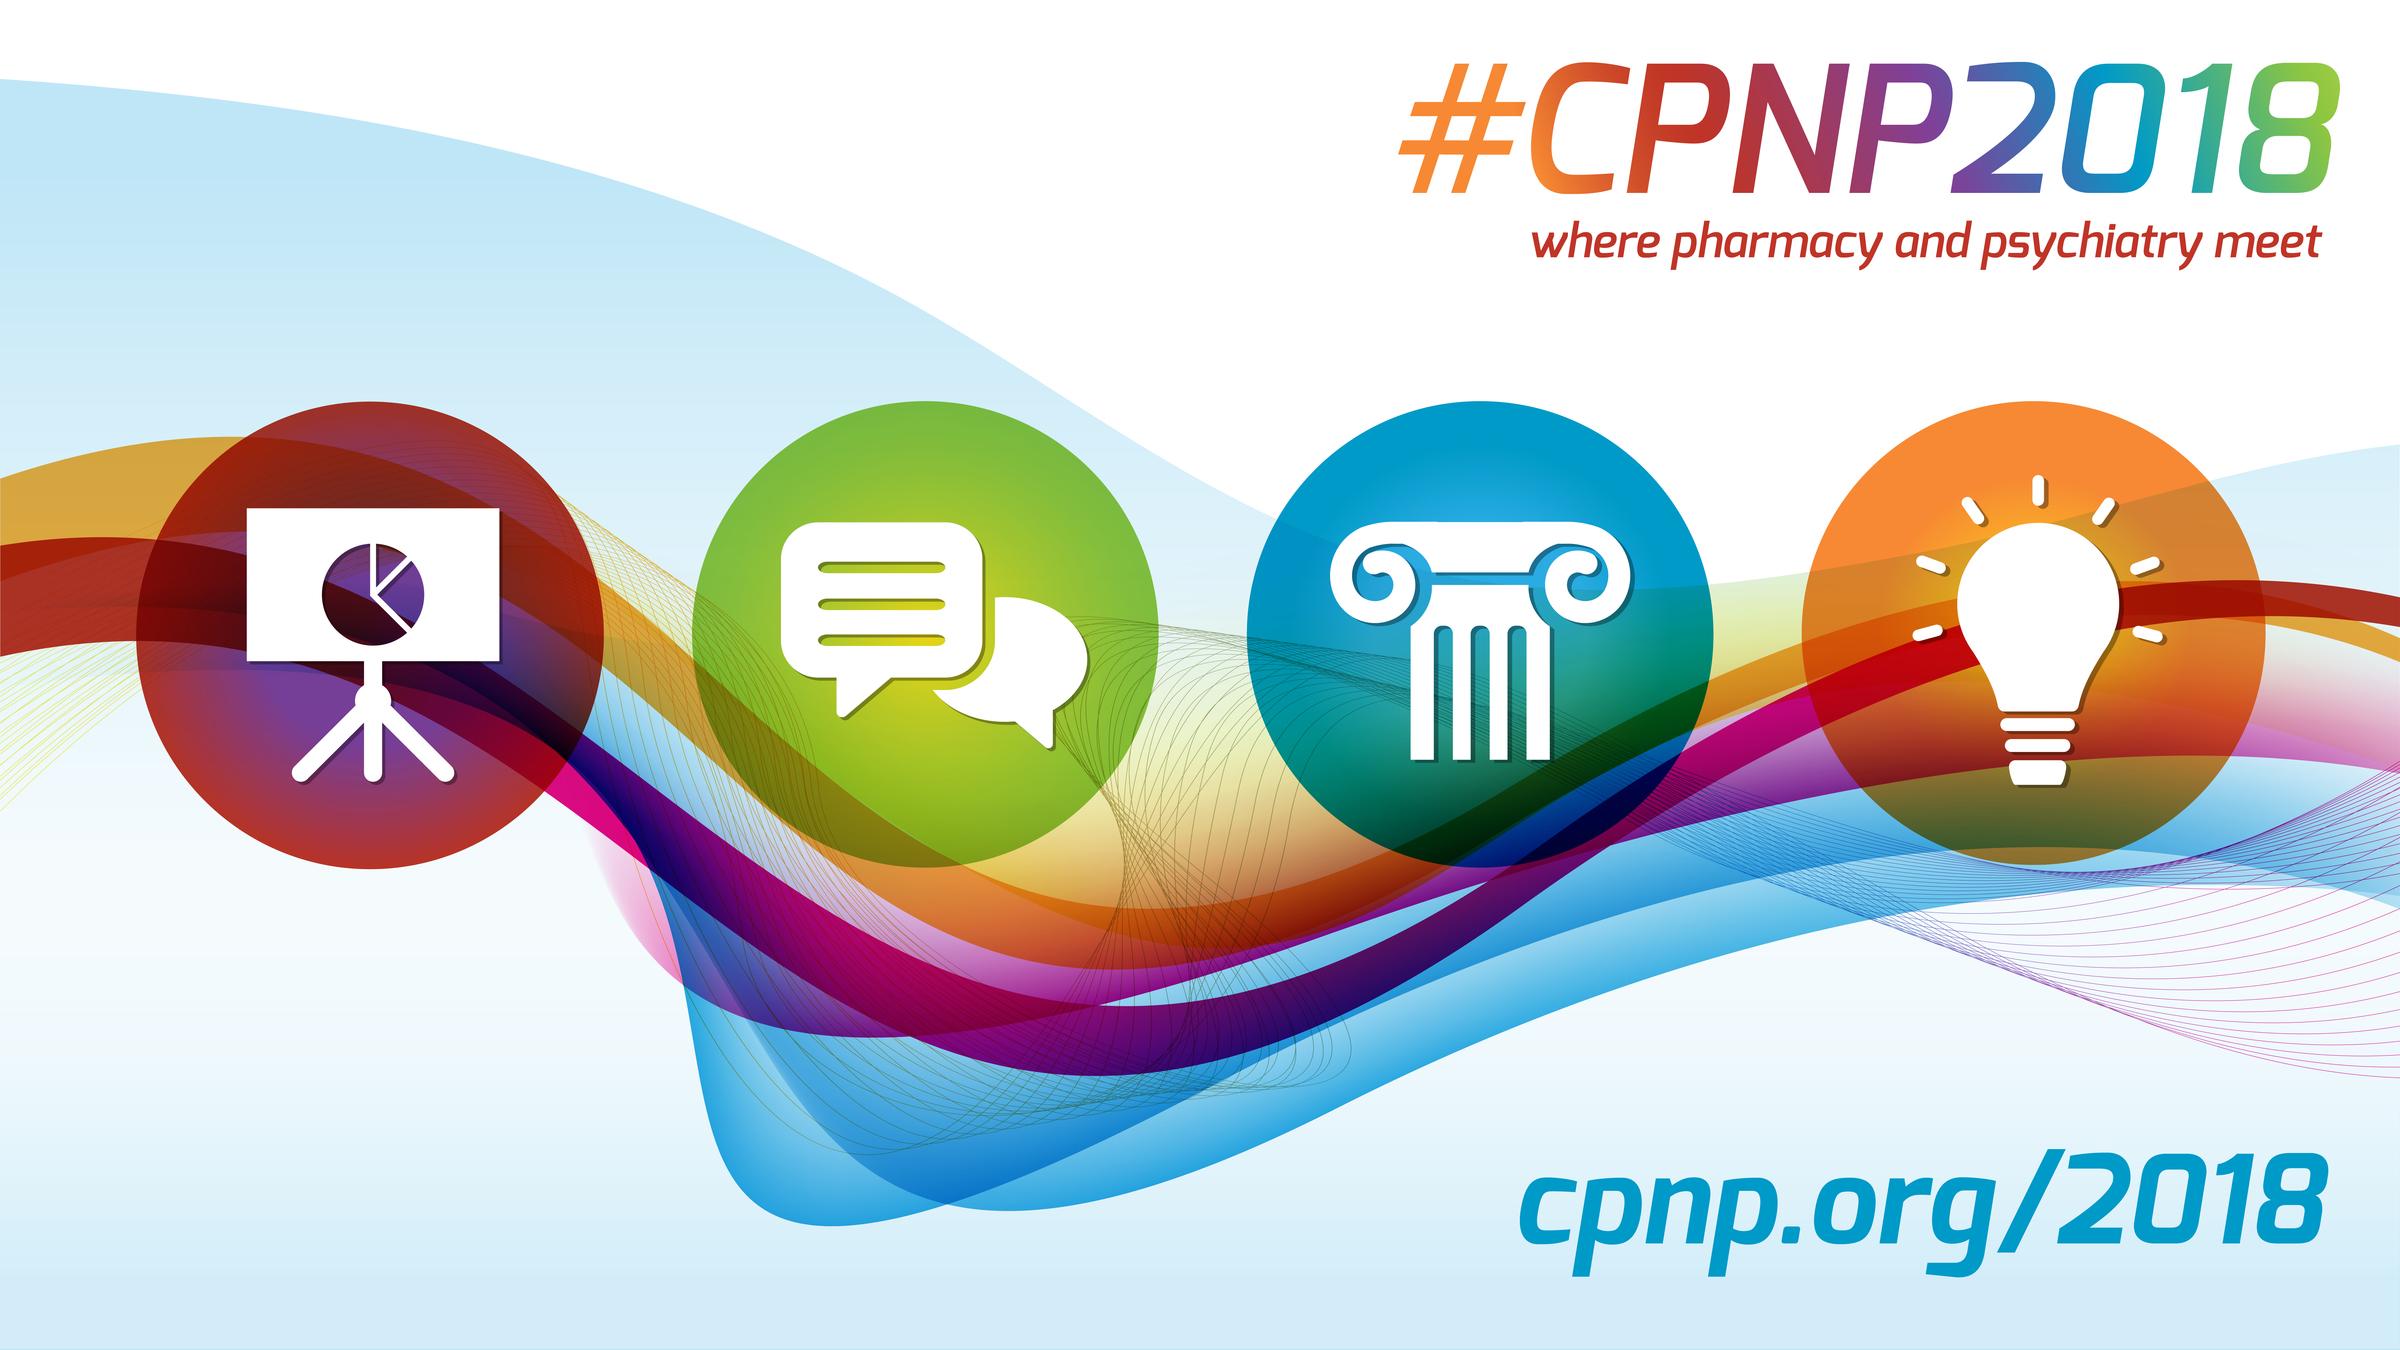 Cpnp.org